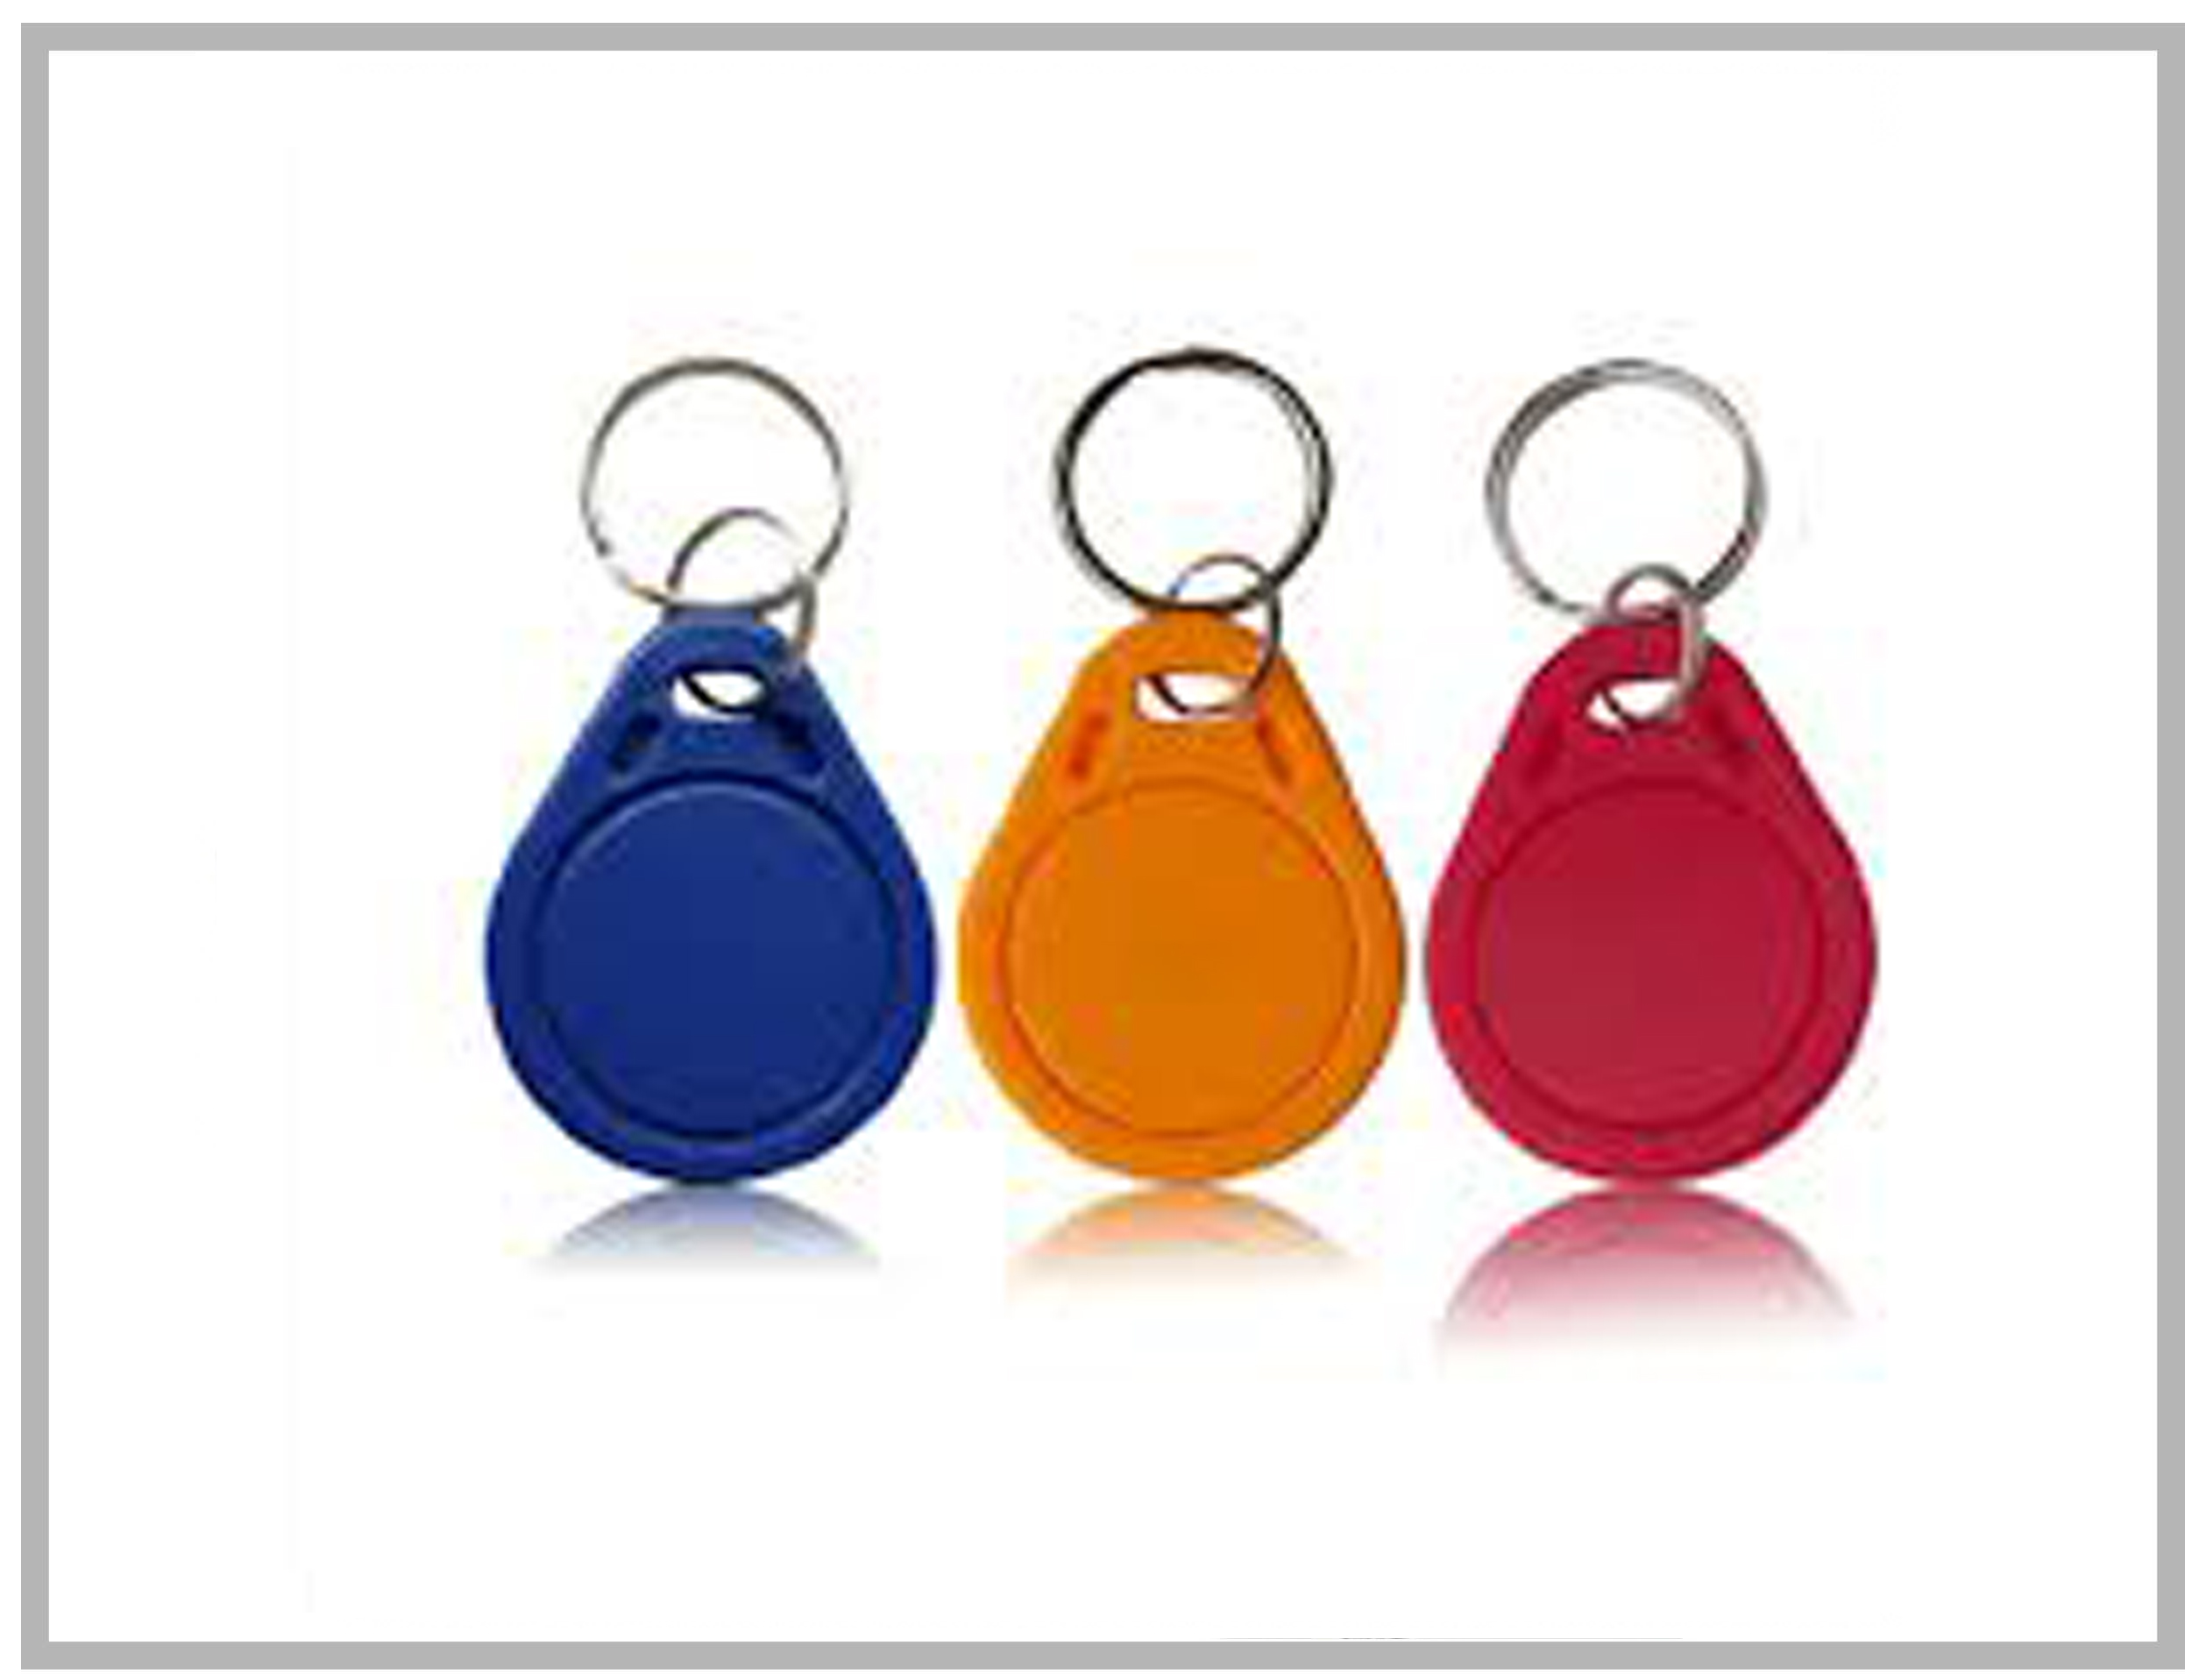 Tag Porte-Clés KeyTag